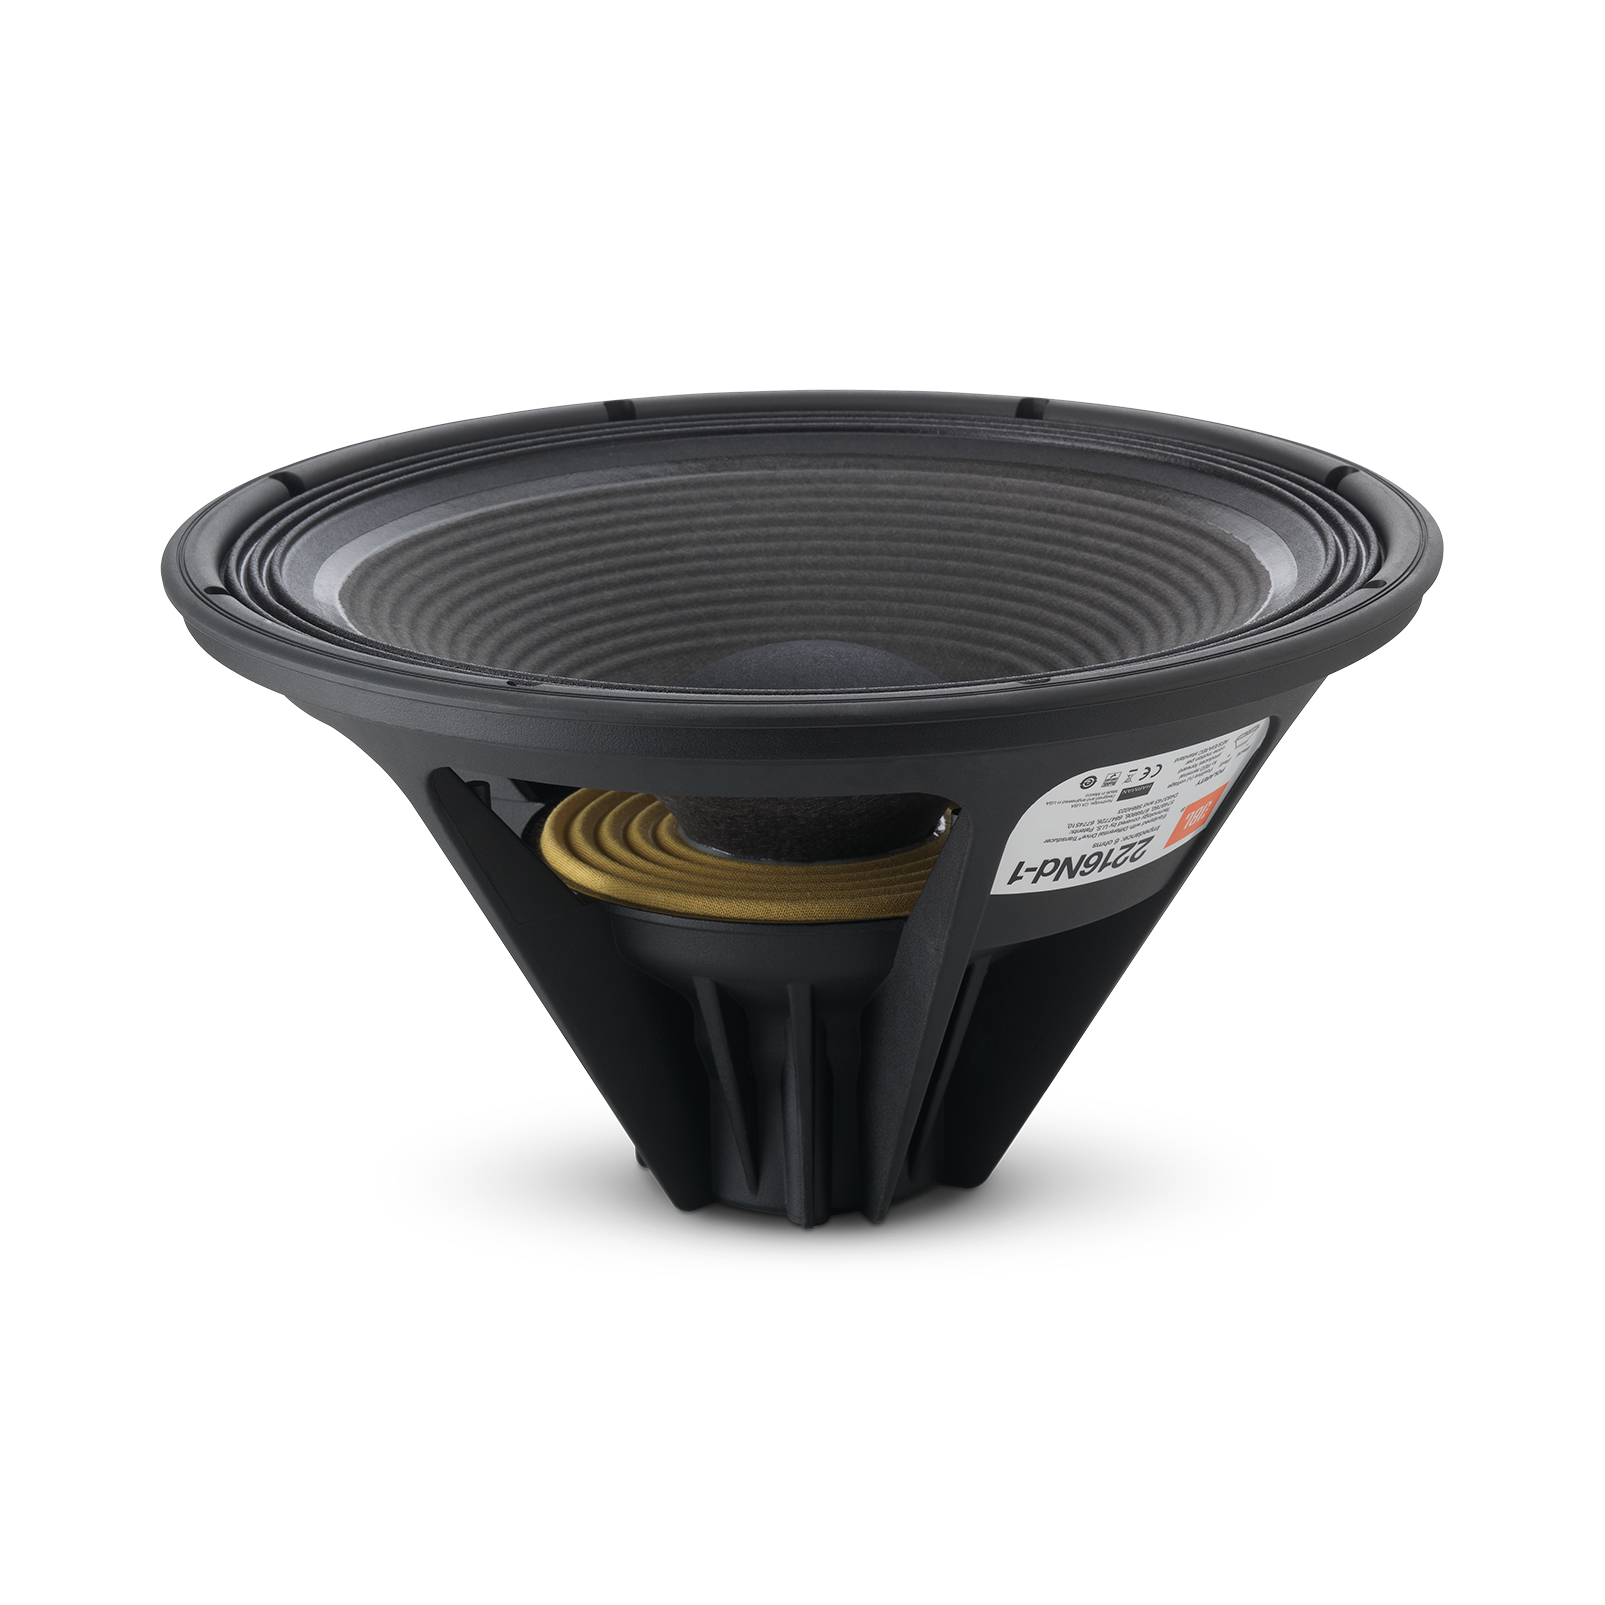 "4367 - Black - 2-way 15"" (380mm) Floorstanding Studio Monitor Loudspeaker - Detailshot 2"